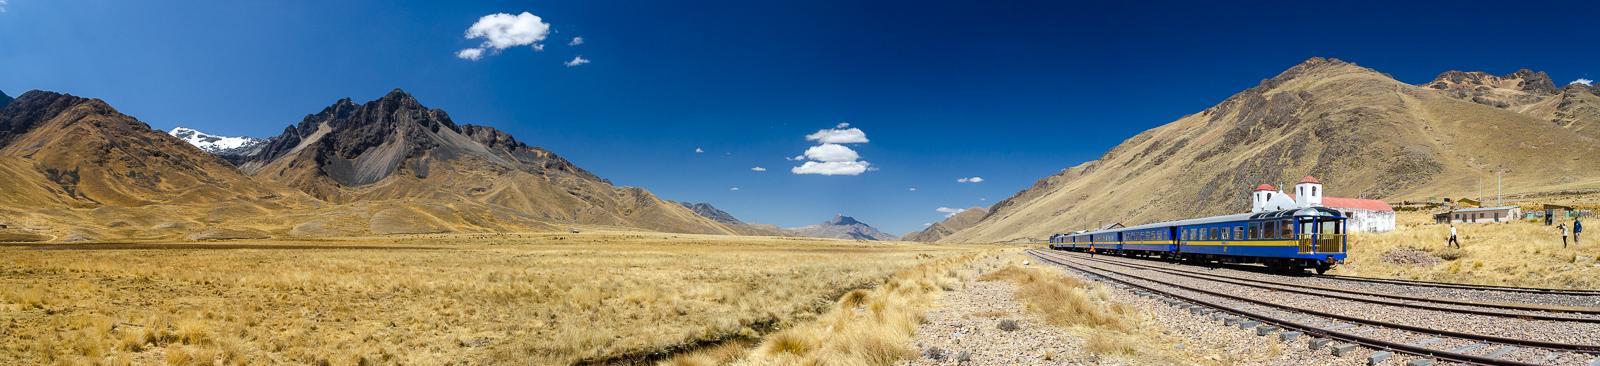 A train to the top of Peru